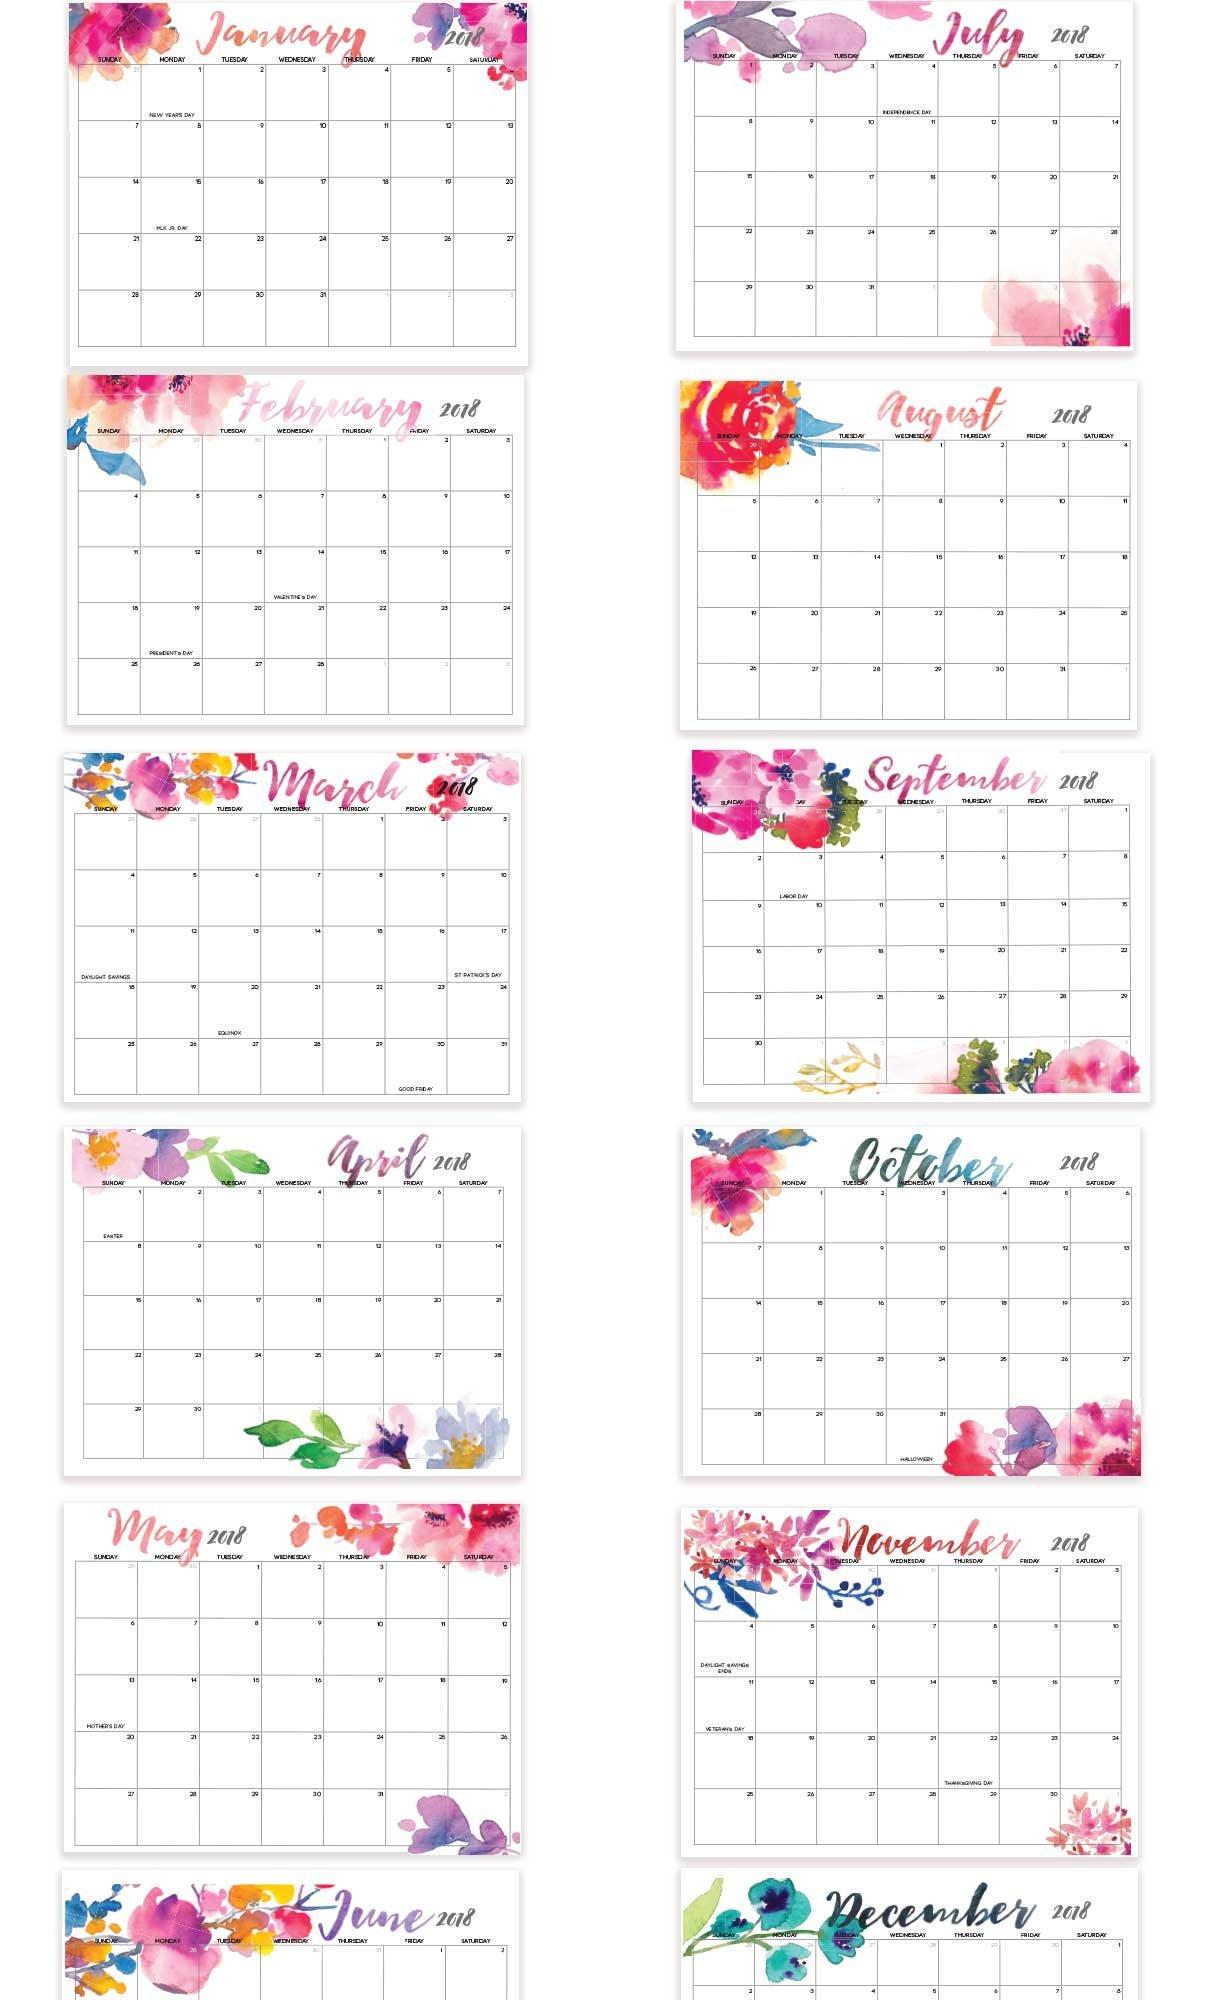 2019 Printable Calendar Editable 12 Month Letter Size | Etsy 12 Month Editable Calendar